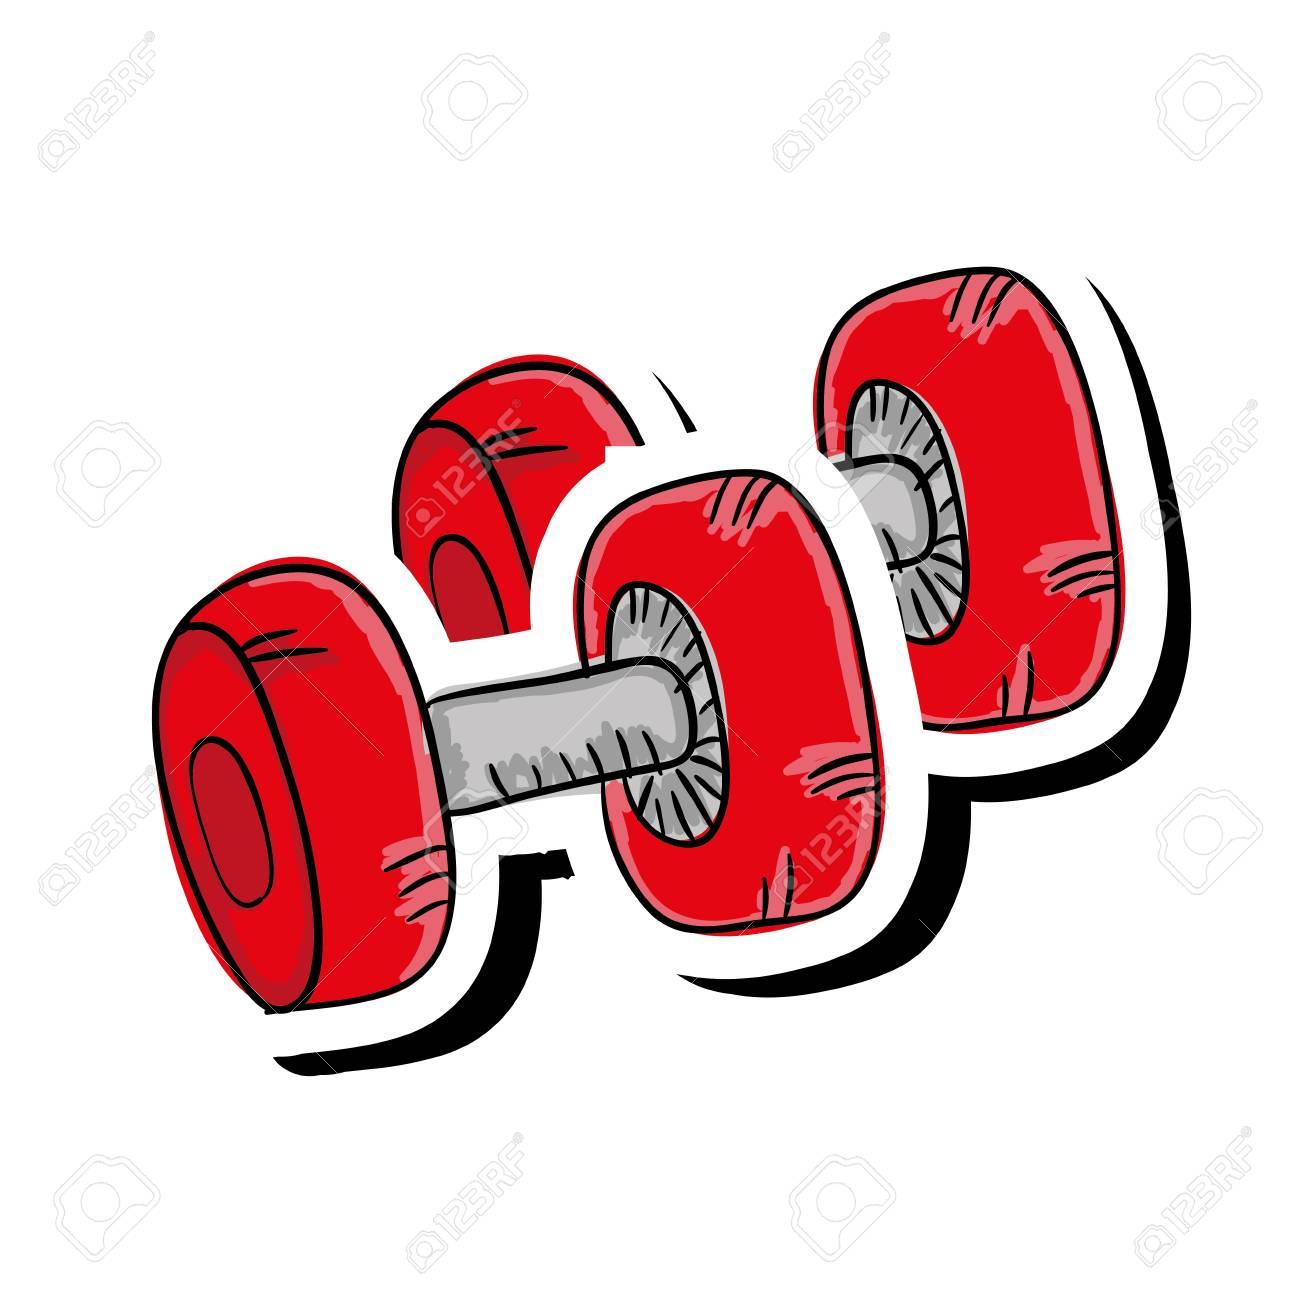 Dumbbell gym equipment » Clipart Station.